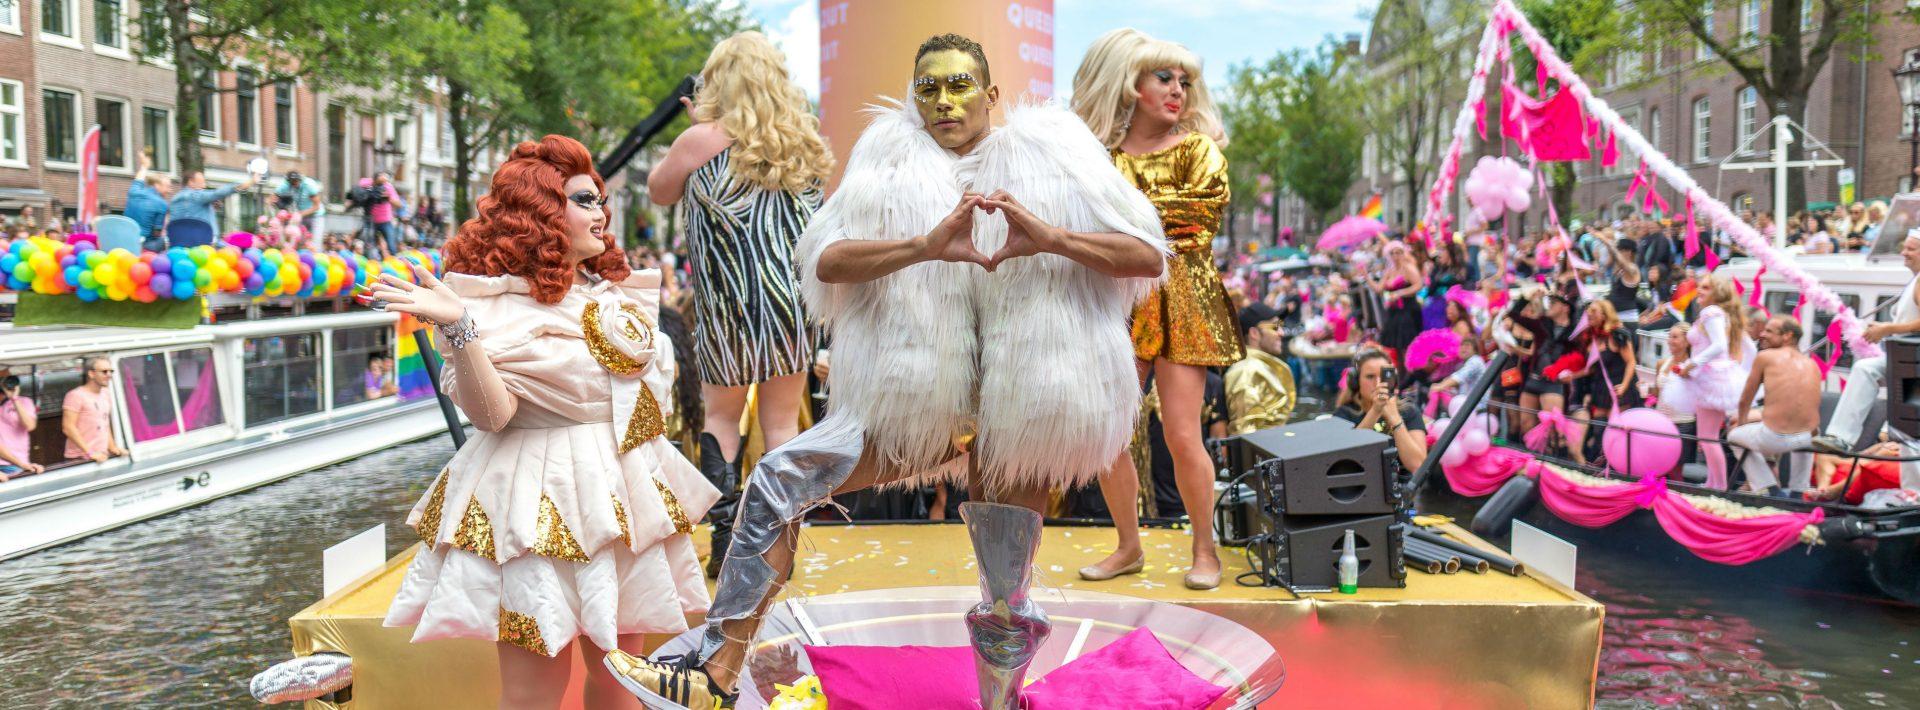 W-Amsterdam_Gay-Pride_Canal-Parade-1522